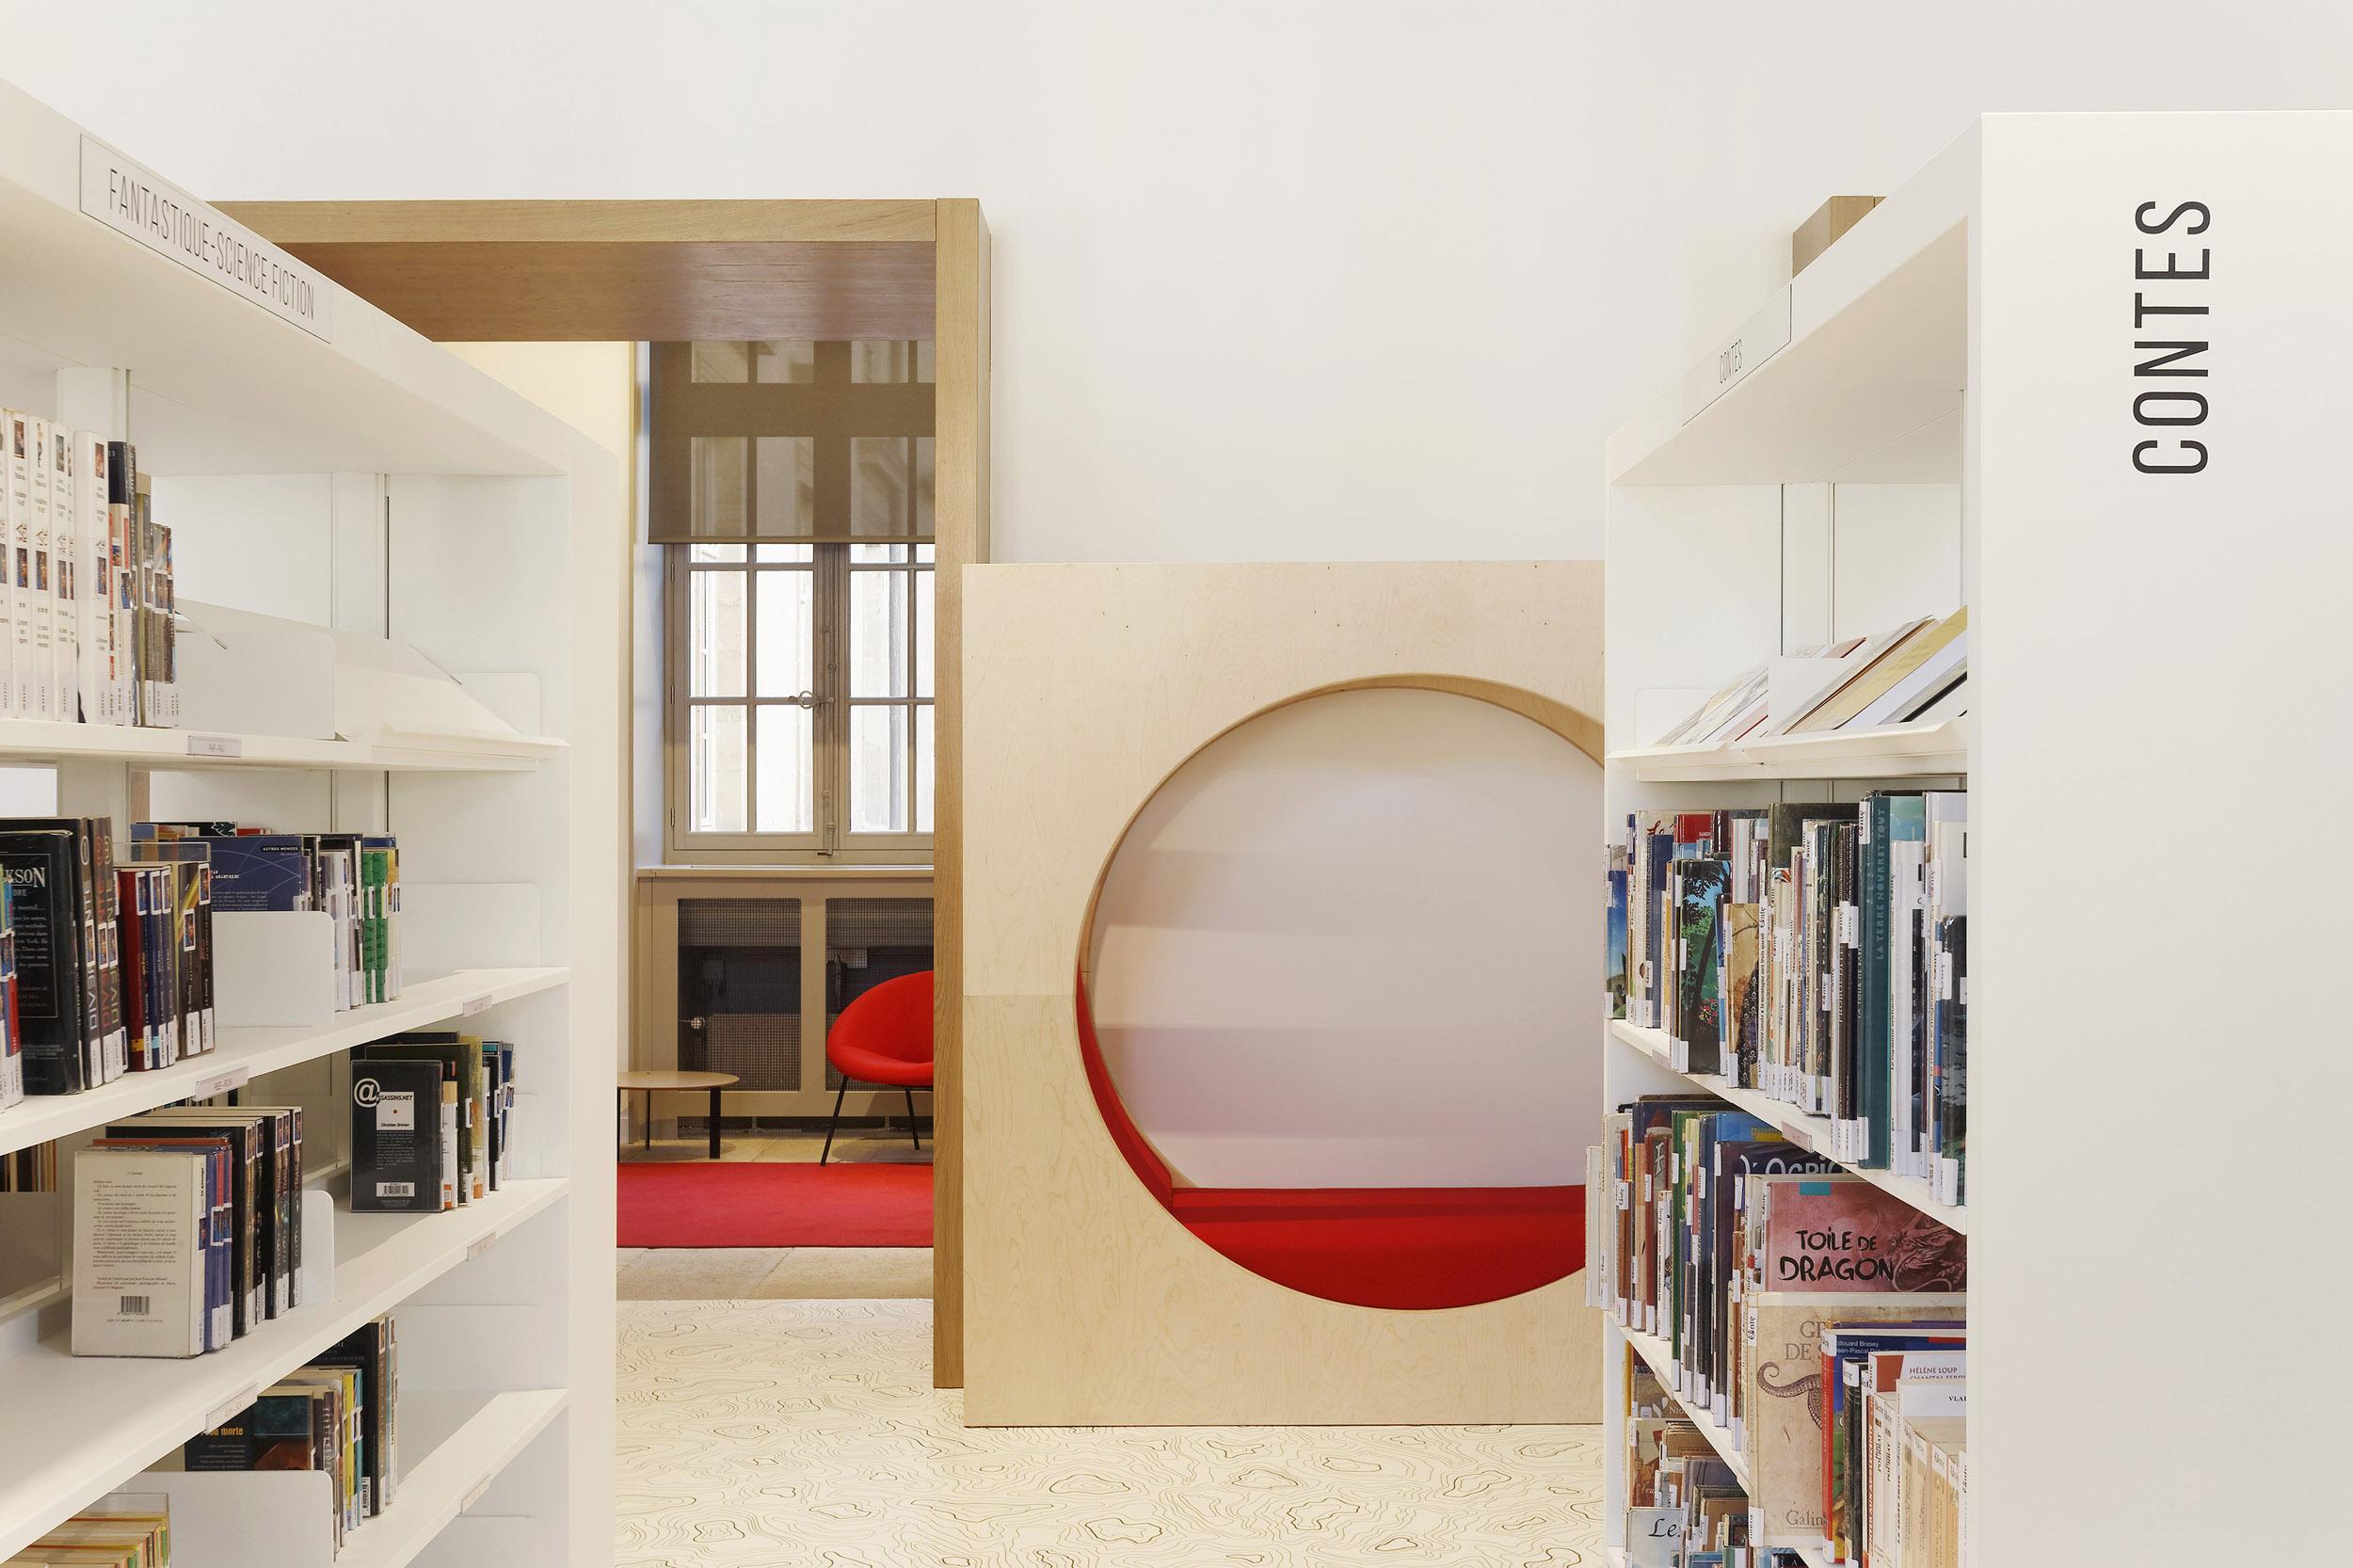 BASALT ARCHITECTURE | MEDIATHEQUE AUTUN | Daniel MOULINET